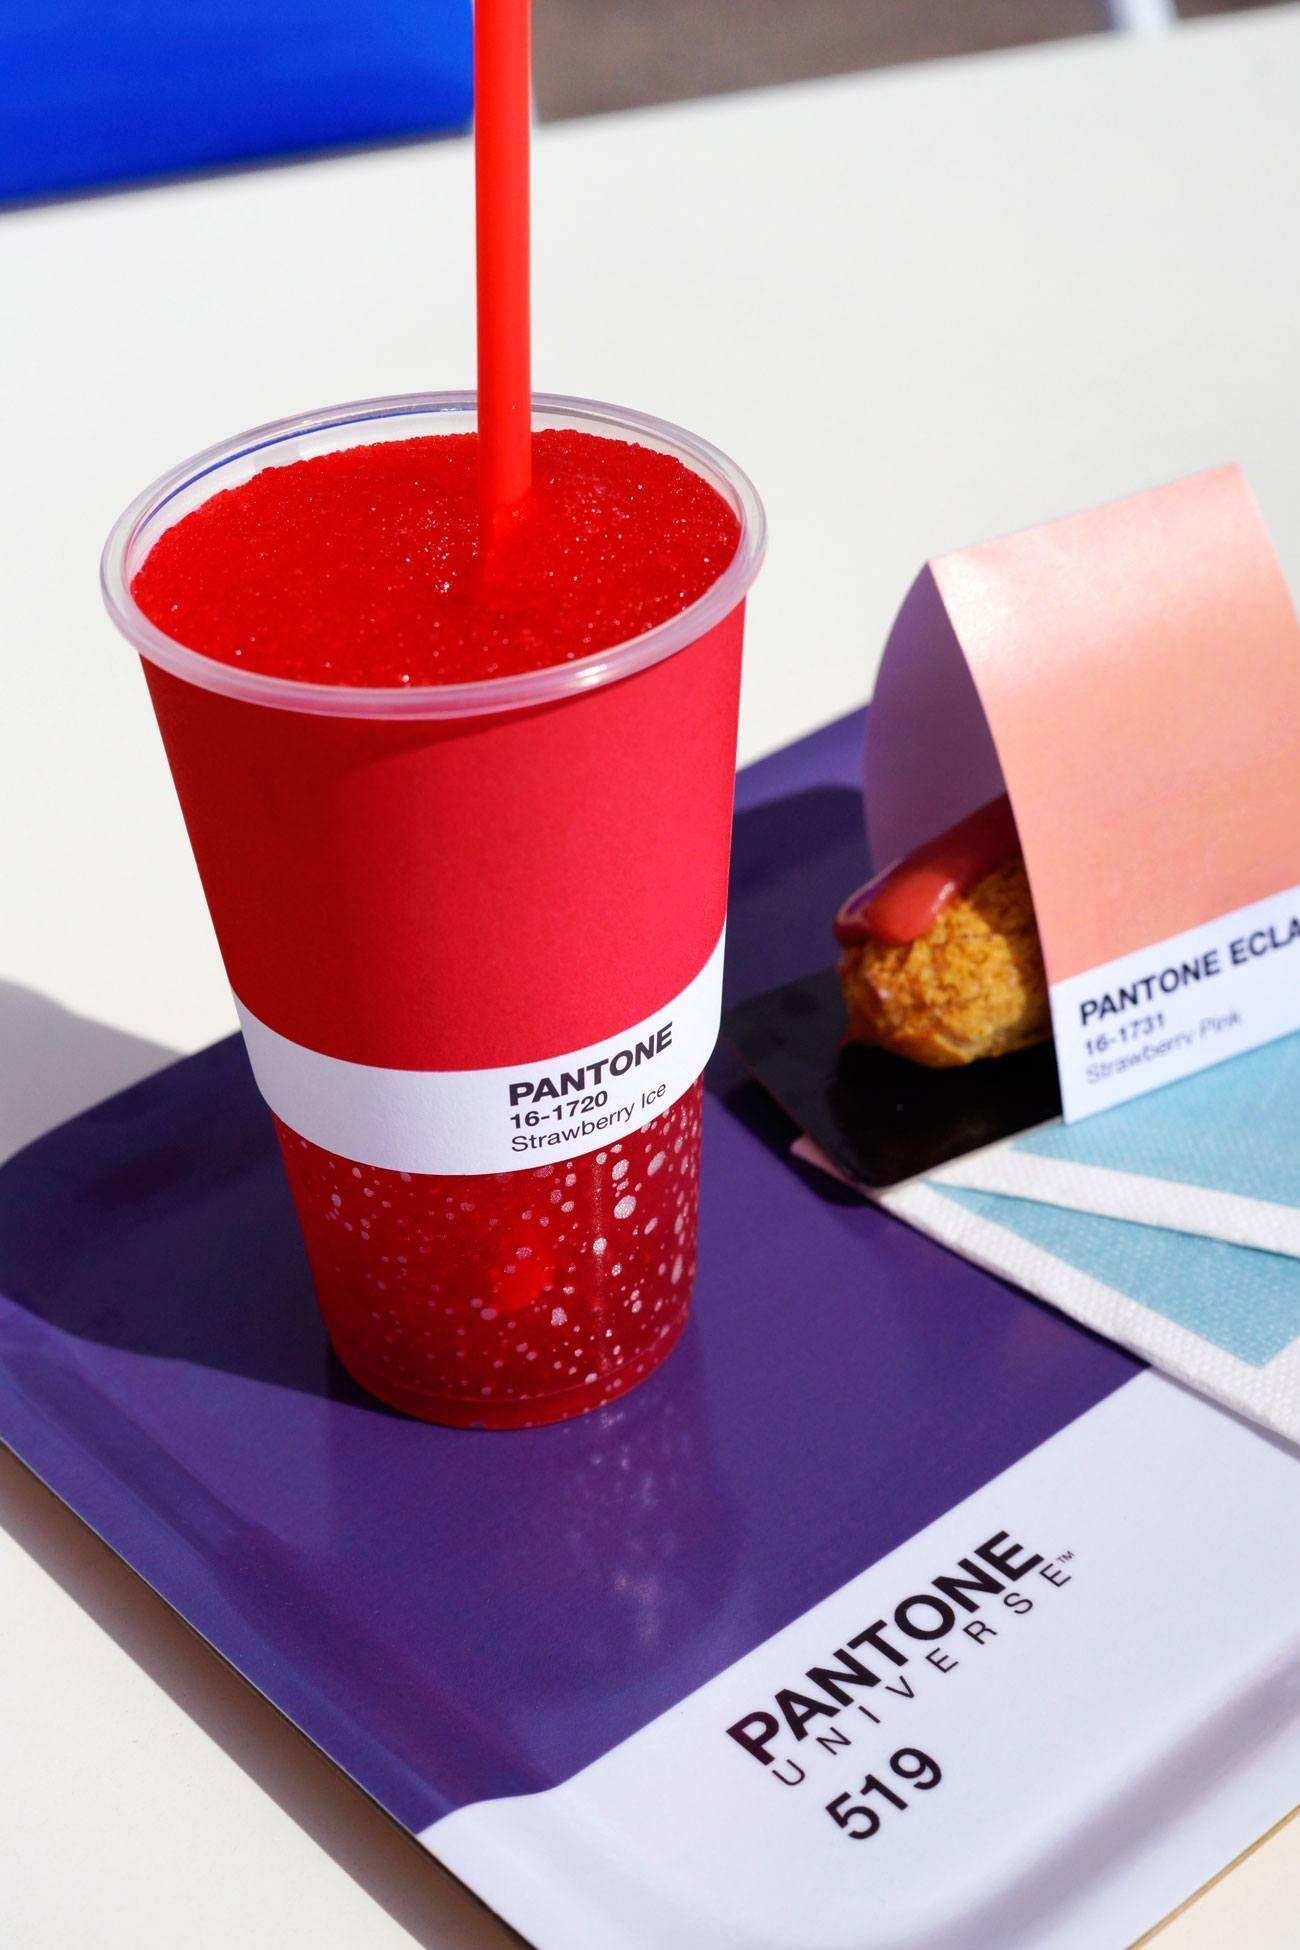 Farben Schmecken Das Pantone Cafe Monaco Pantone Cafe Pantone